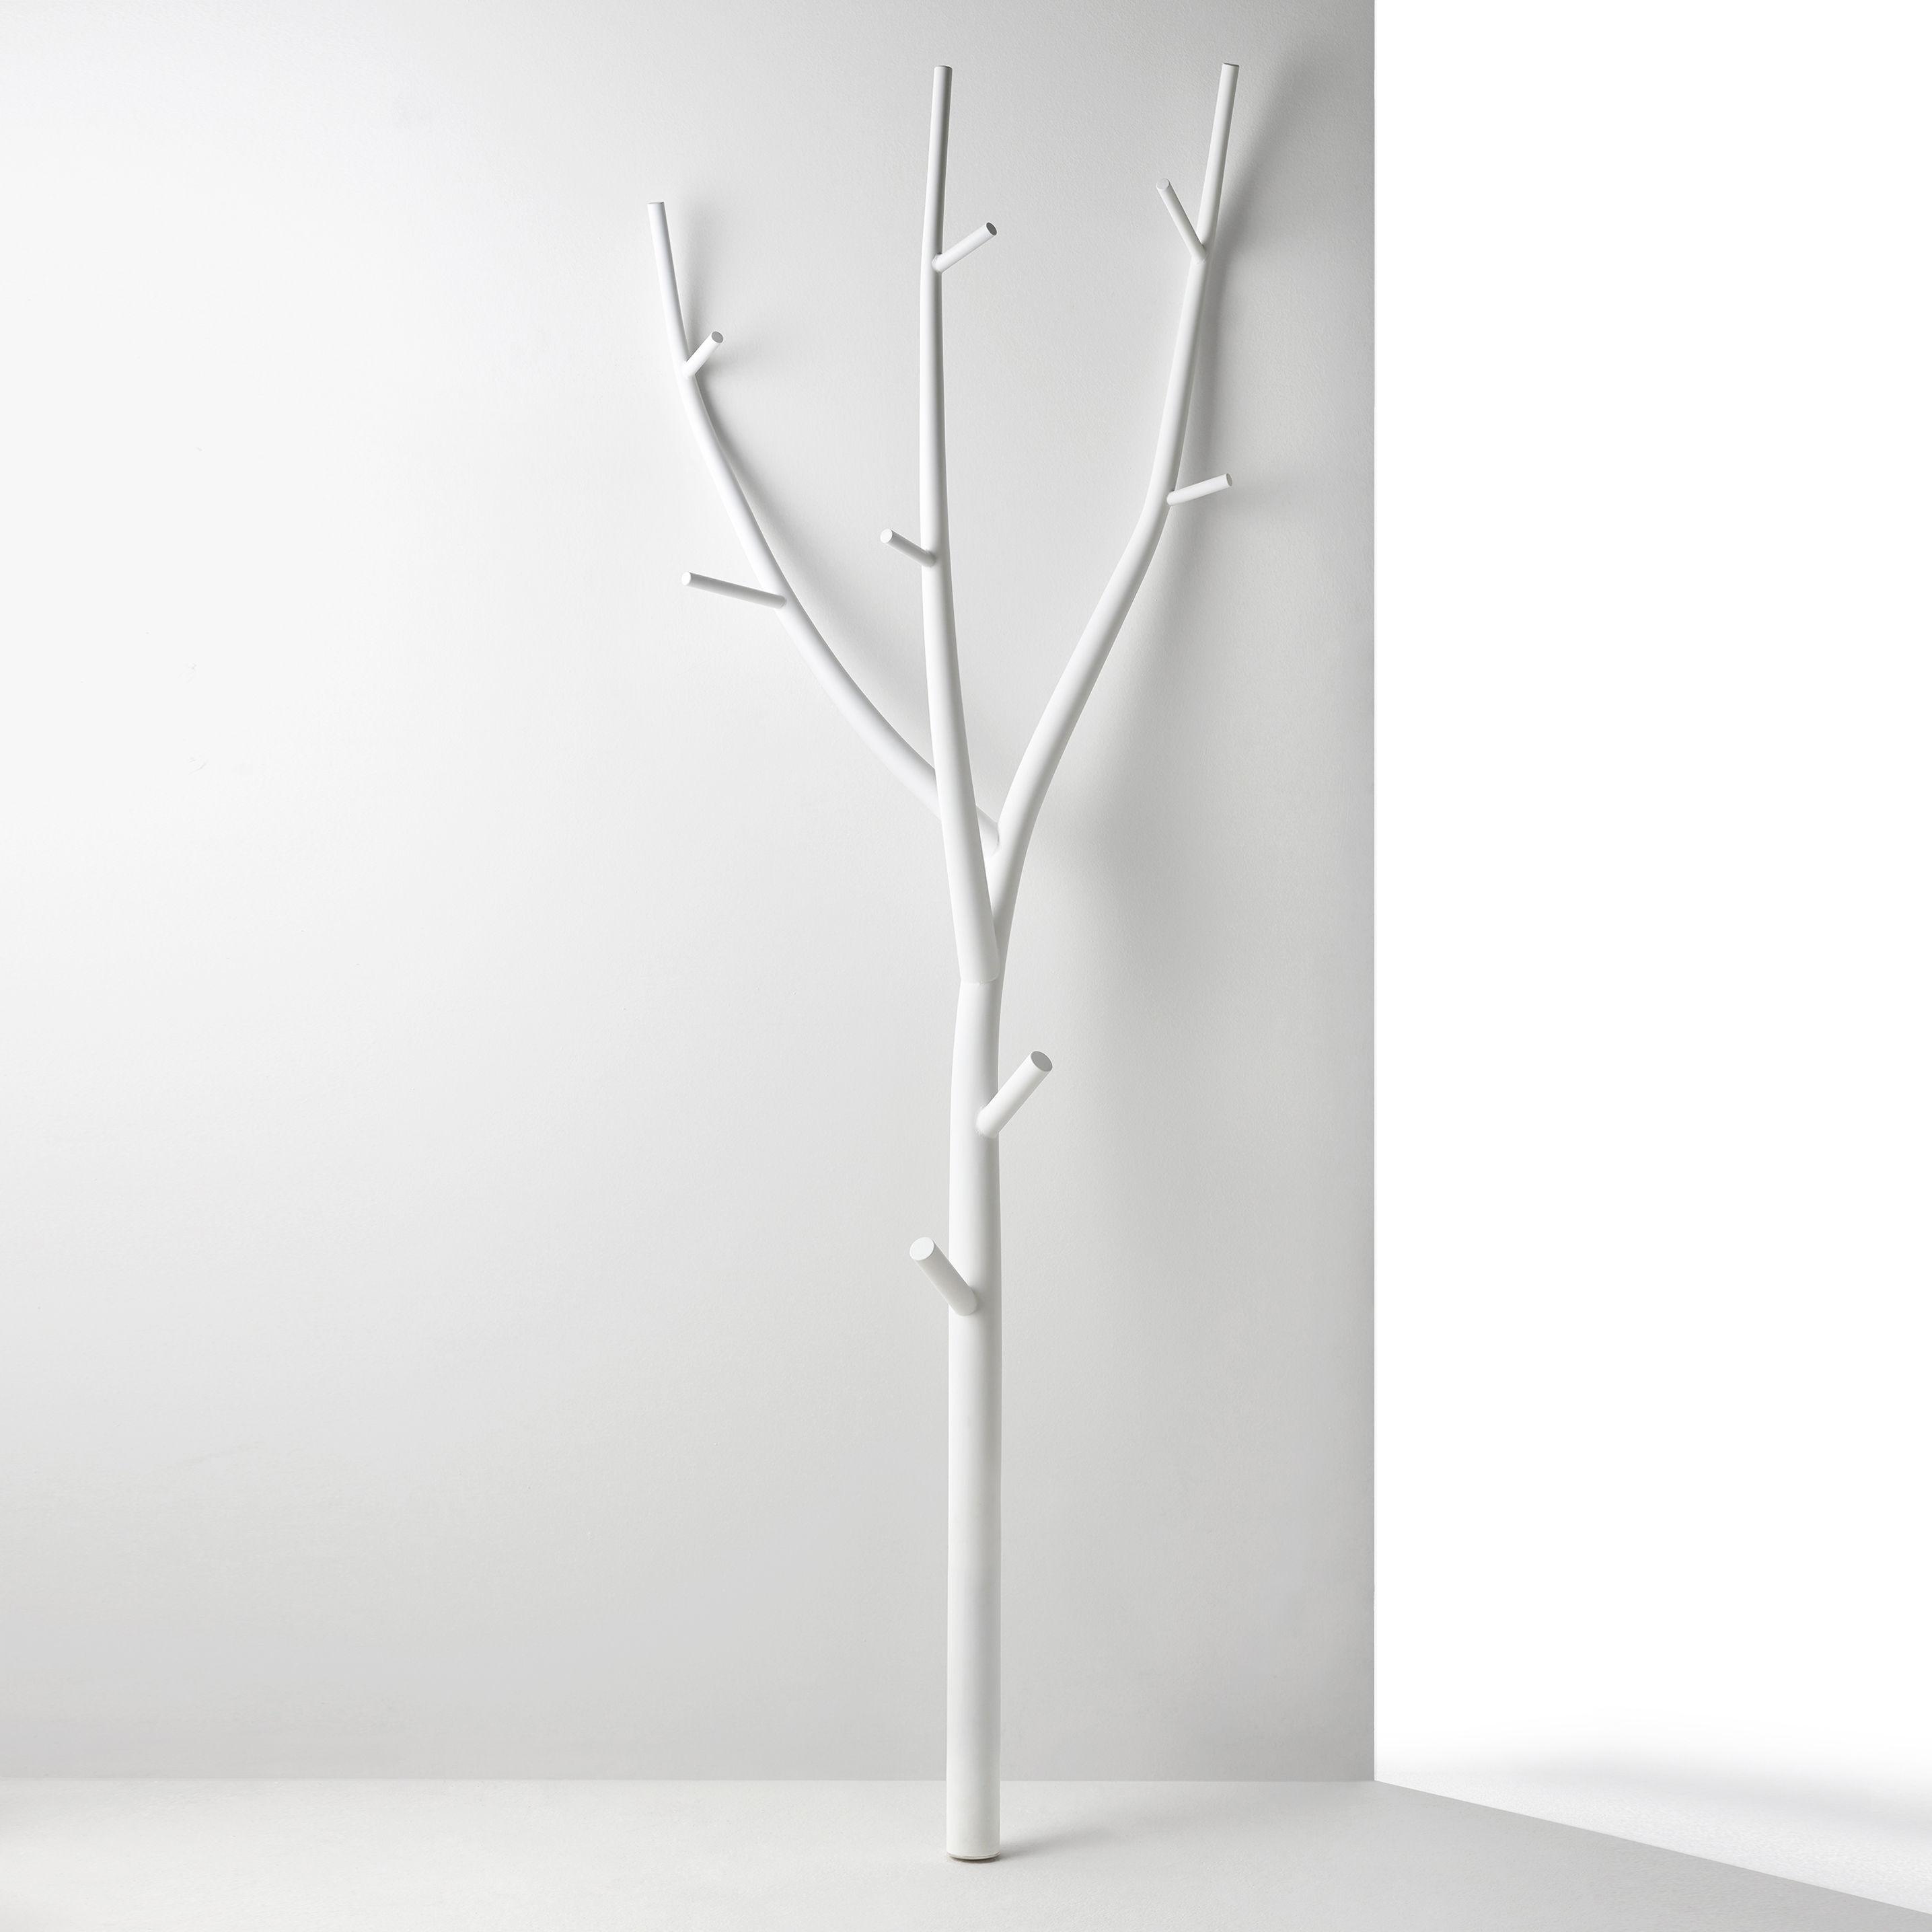 Furniture - Coat Racks & Pegs - Ramo Coat stand - / Steel - L 70 x H 205 cm by Opinion Ciatti - White - Steel